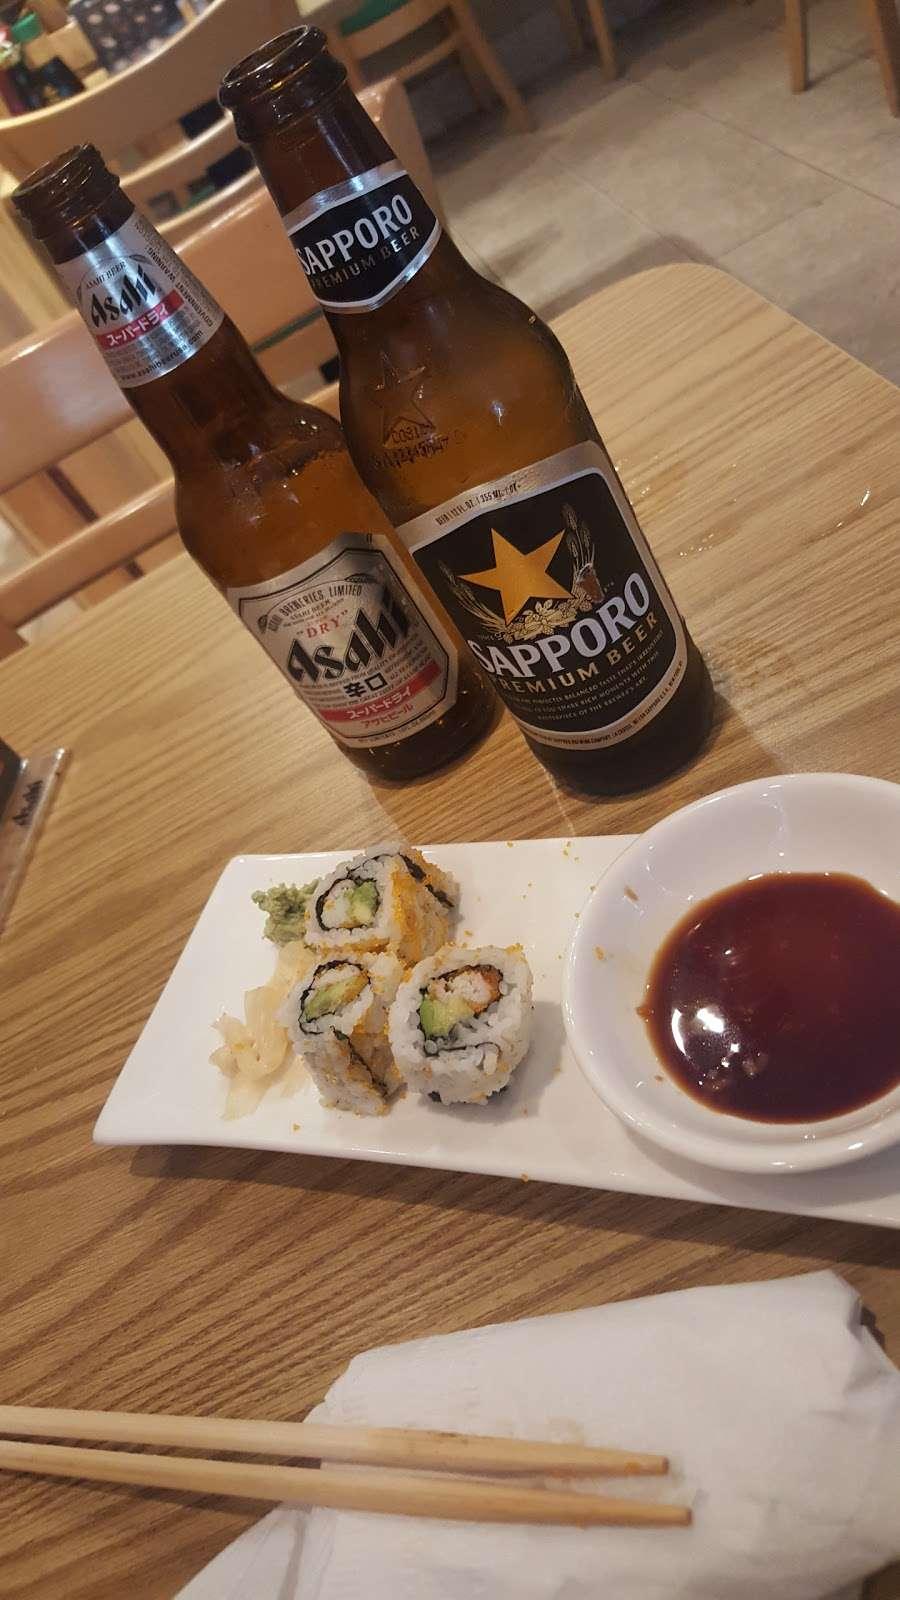 Yokohama - restaurant  | Photo 6 of 6 | Address: 438 W 238th St, Bronx, NY 10463, USA